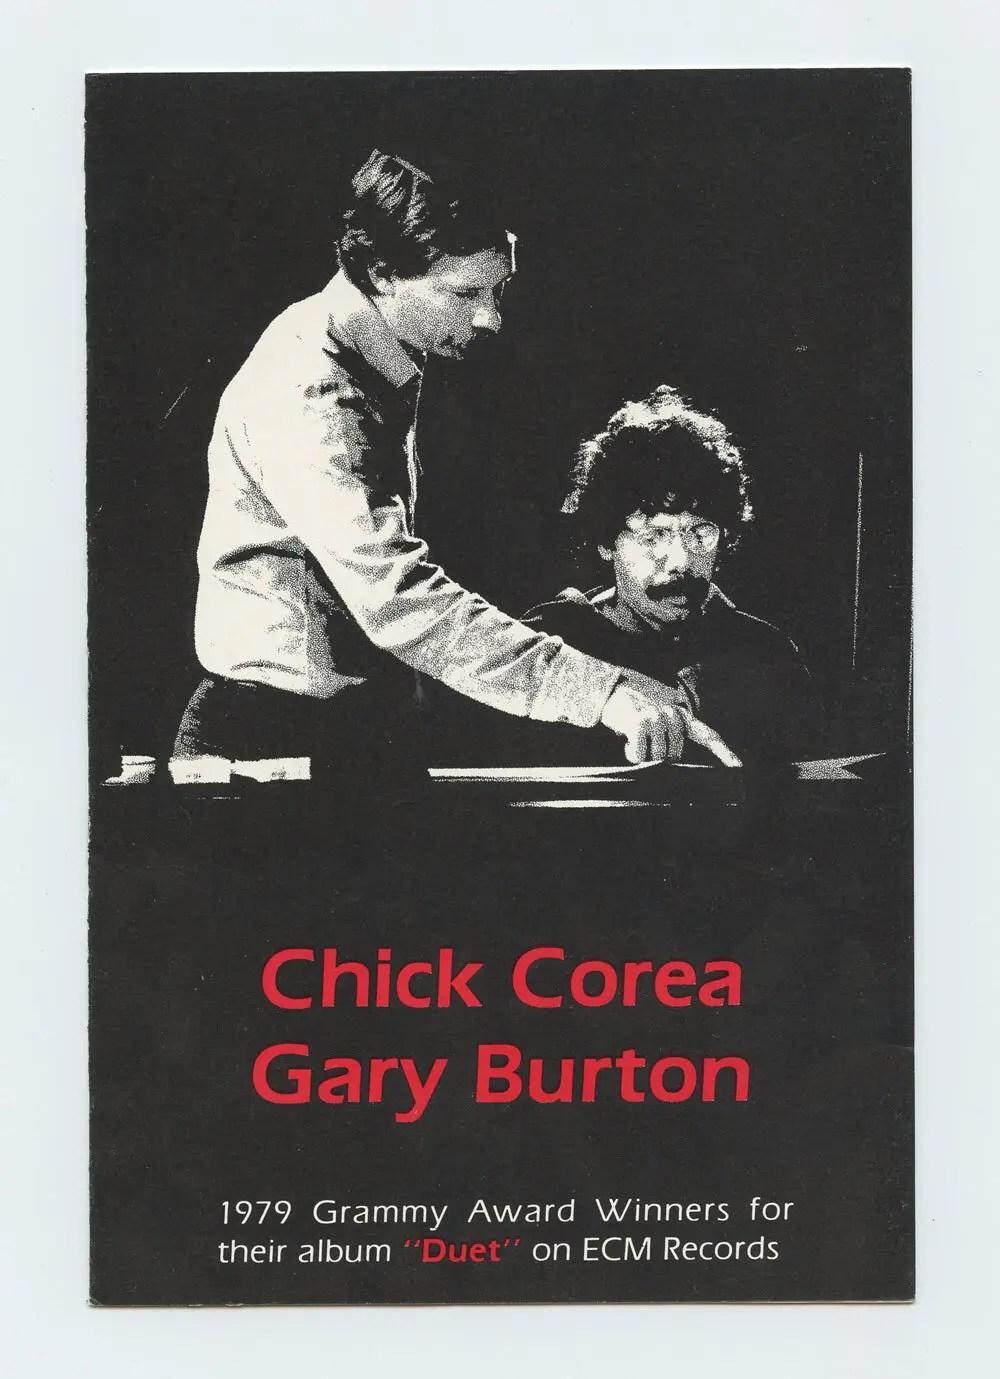 Chick Corea Gary Burton Handbill 1979 album DUET promo